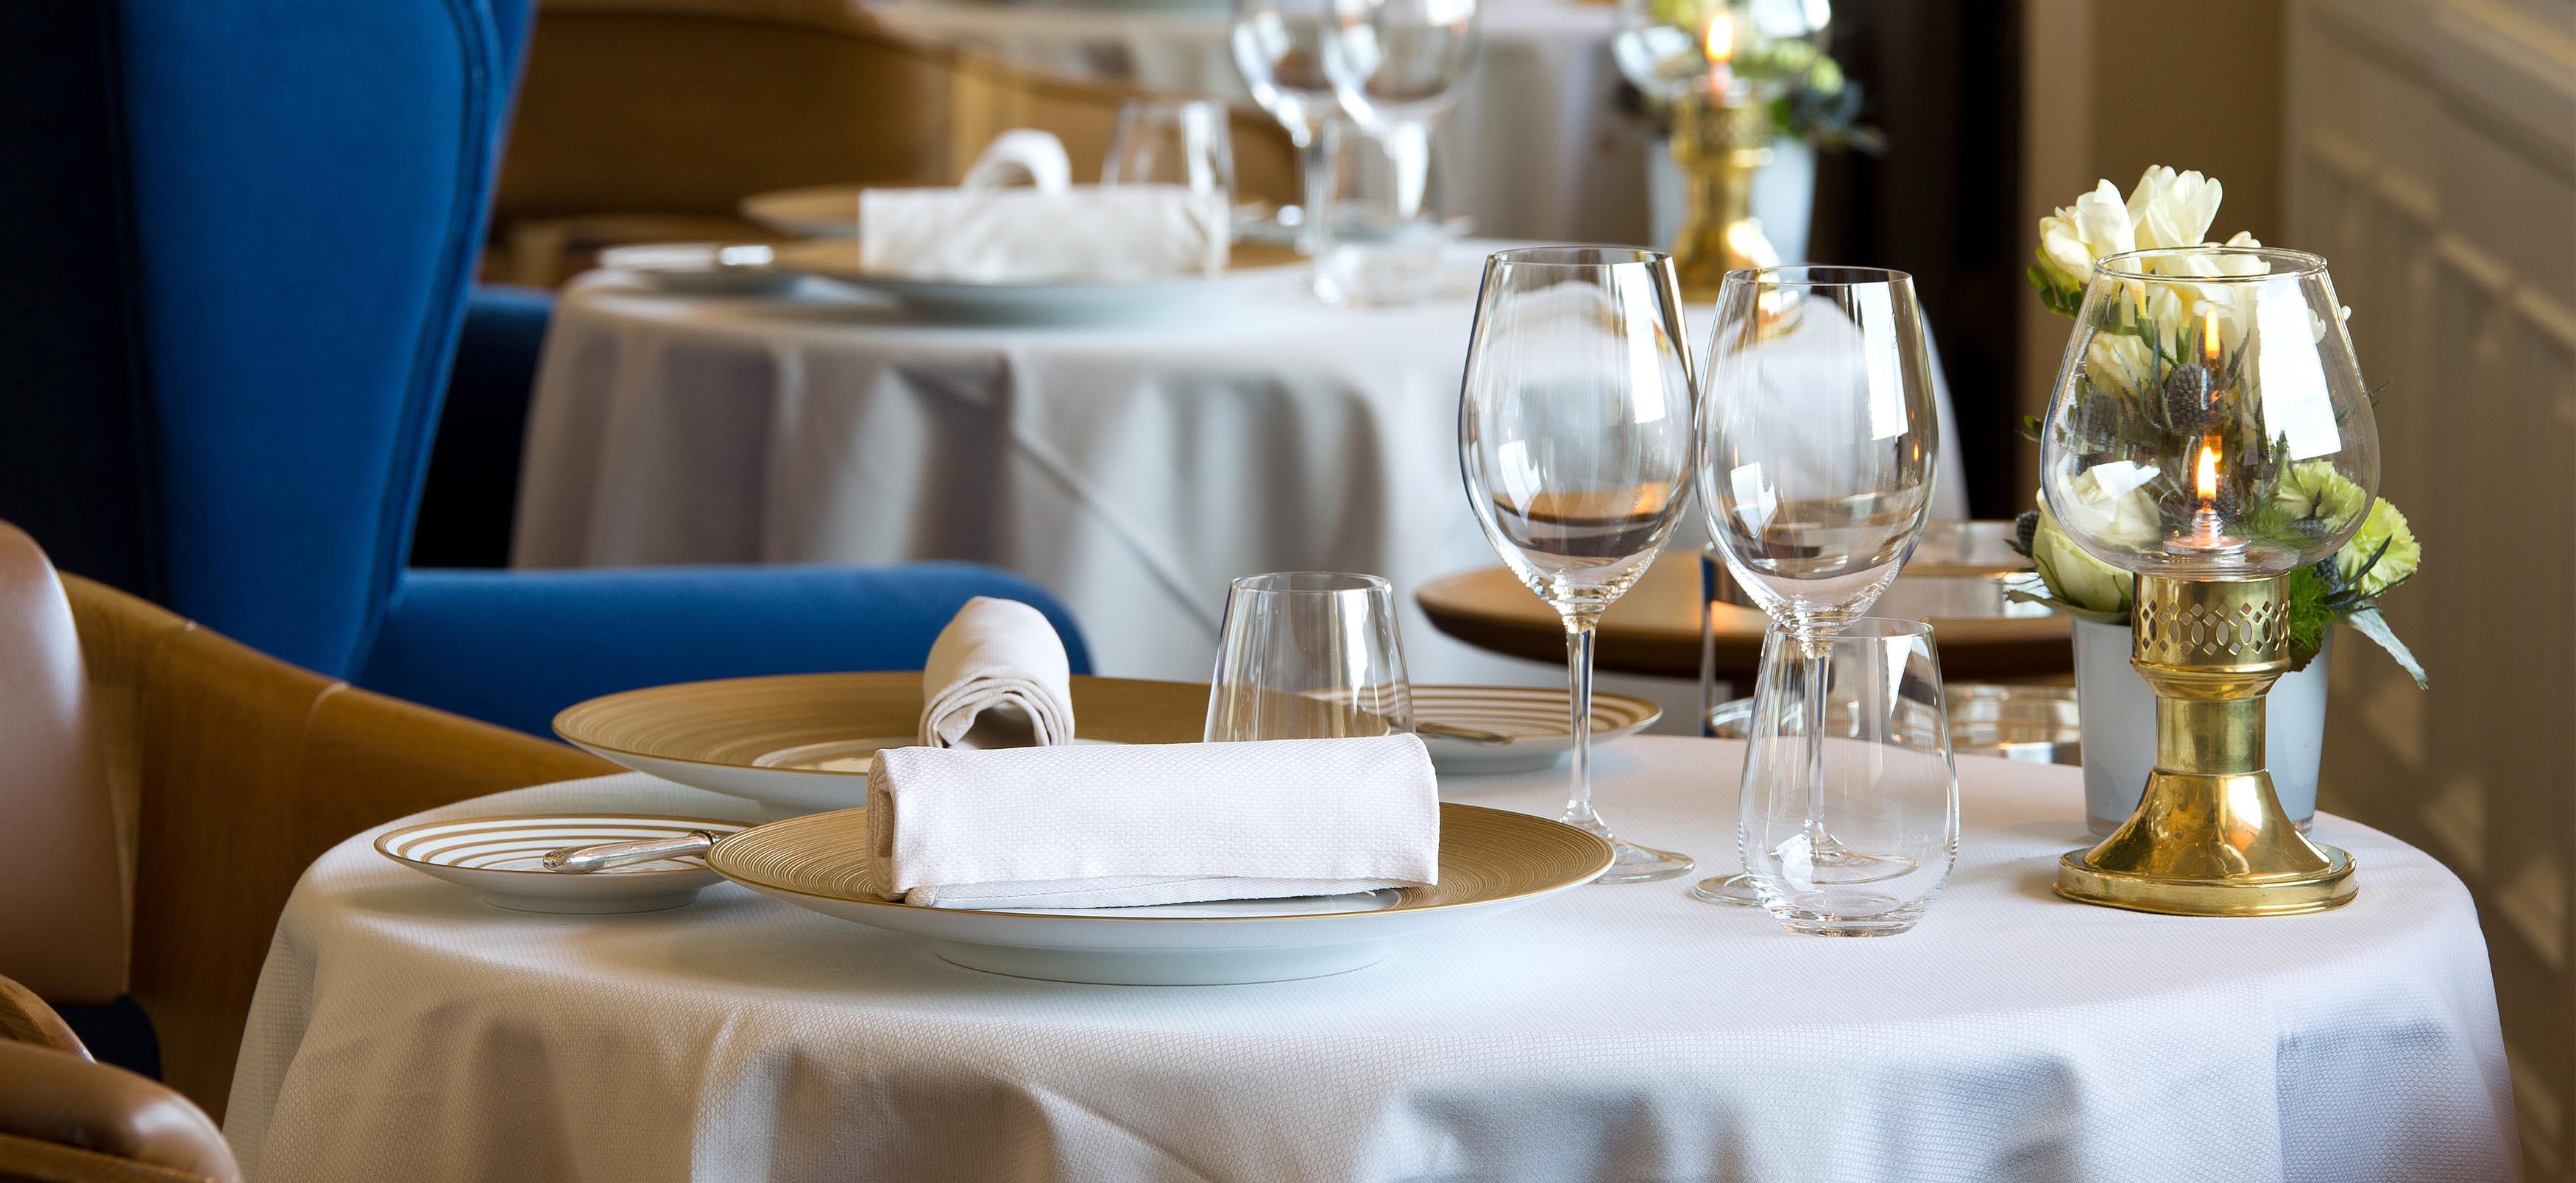 Golf La Prairie >> Gastronomy Gift Box in France - Gourmet break EVIAN. Luxury 5-star Hotel ROYAL